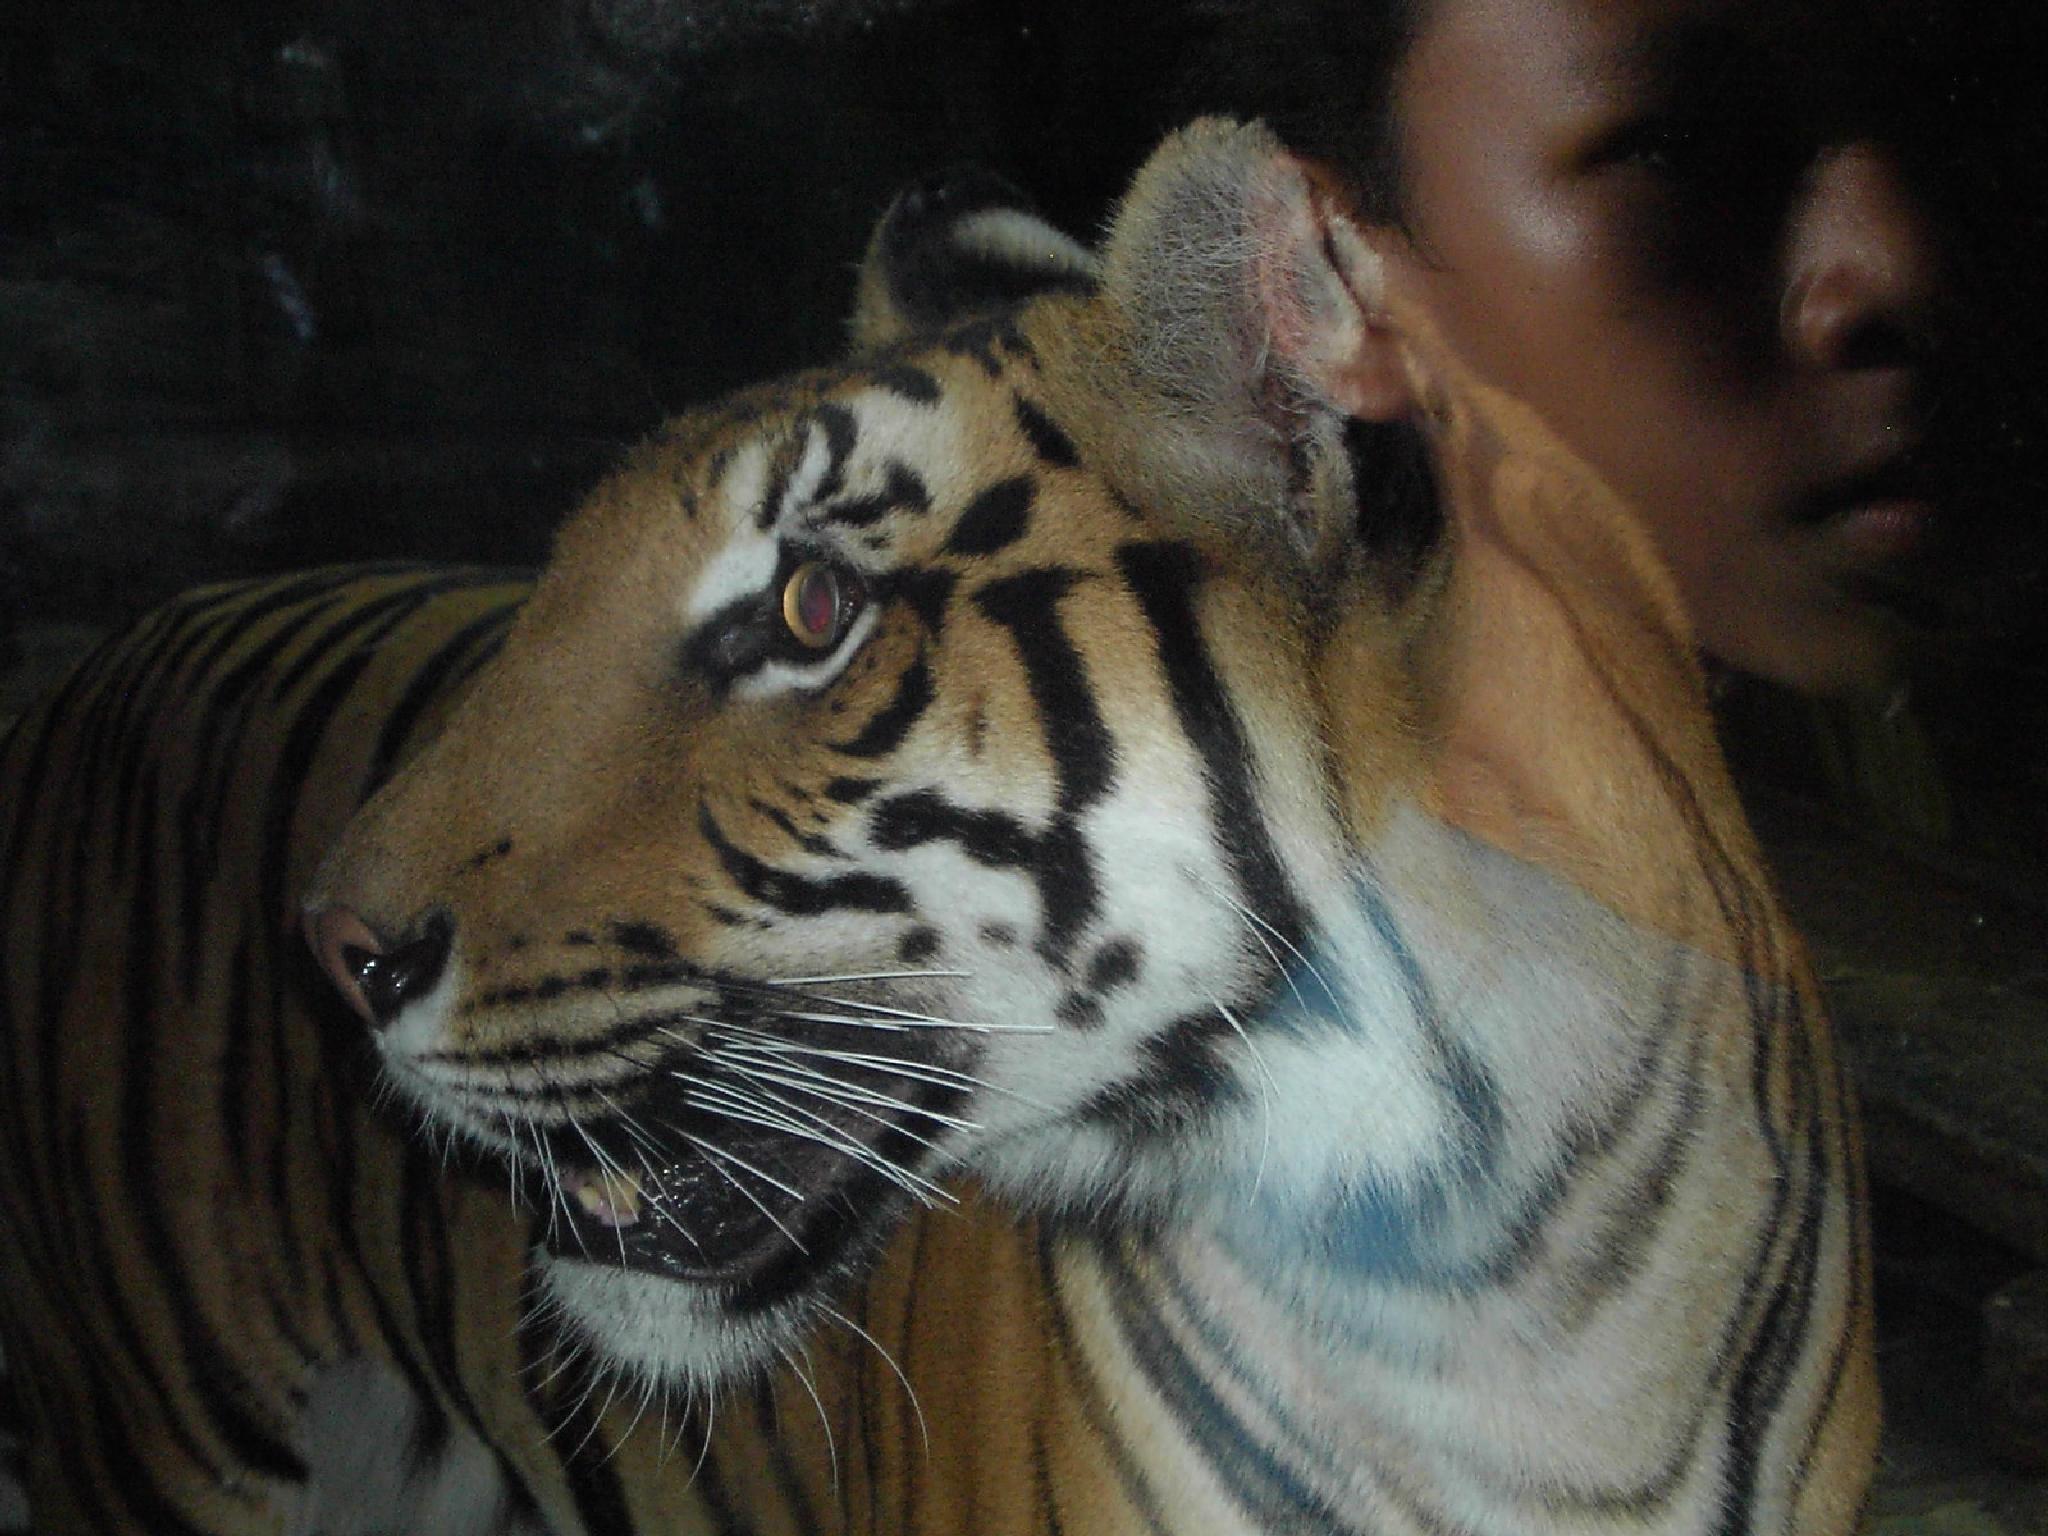 Eye of the tiger by MissXavierBurgess